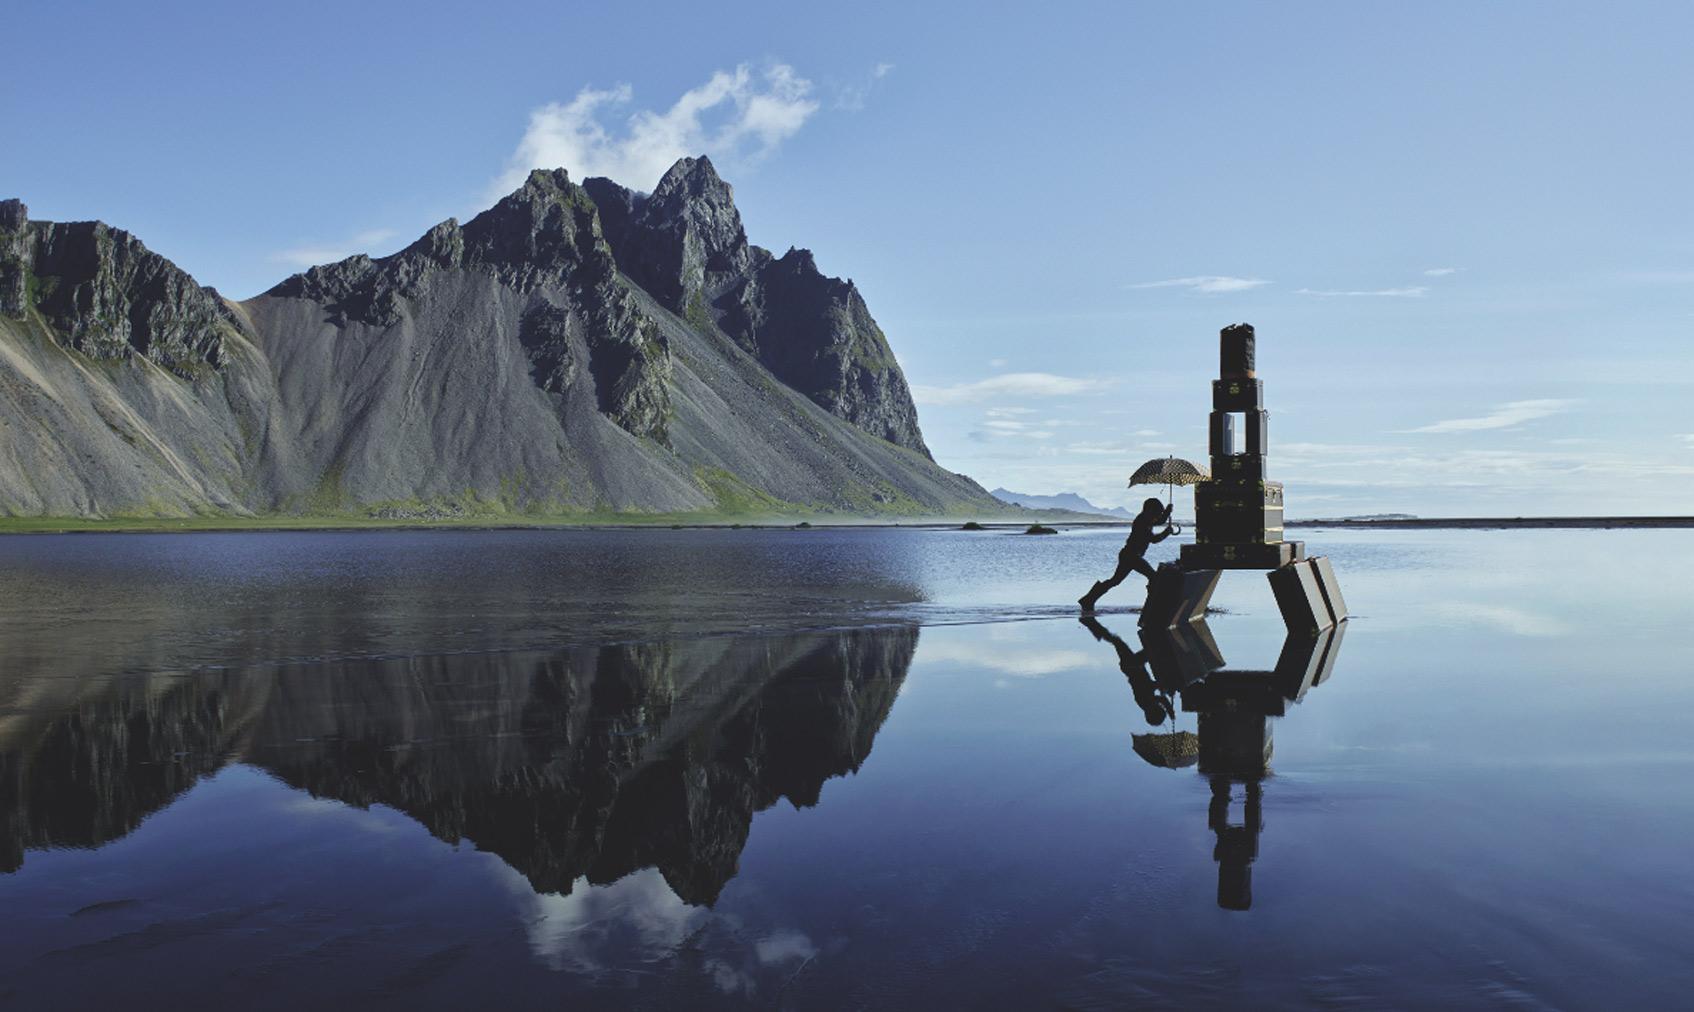 louis vuitton исландские пейзажи